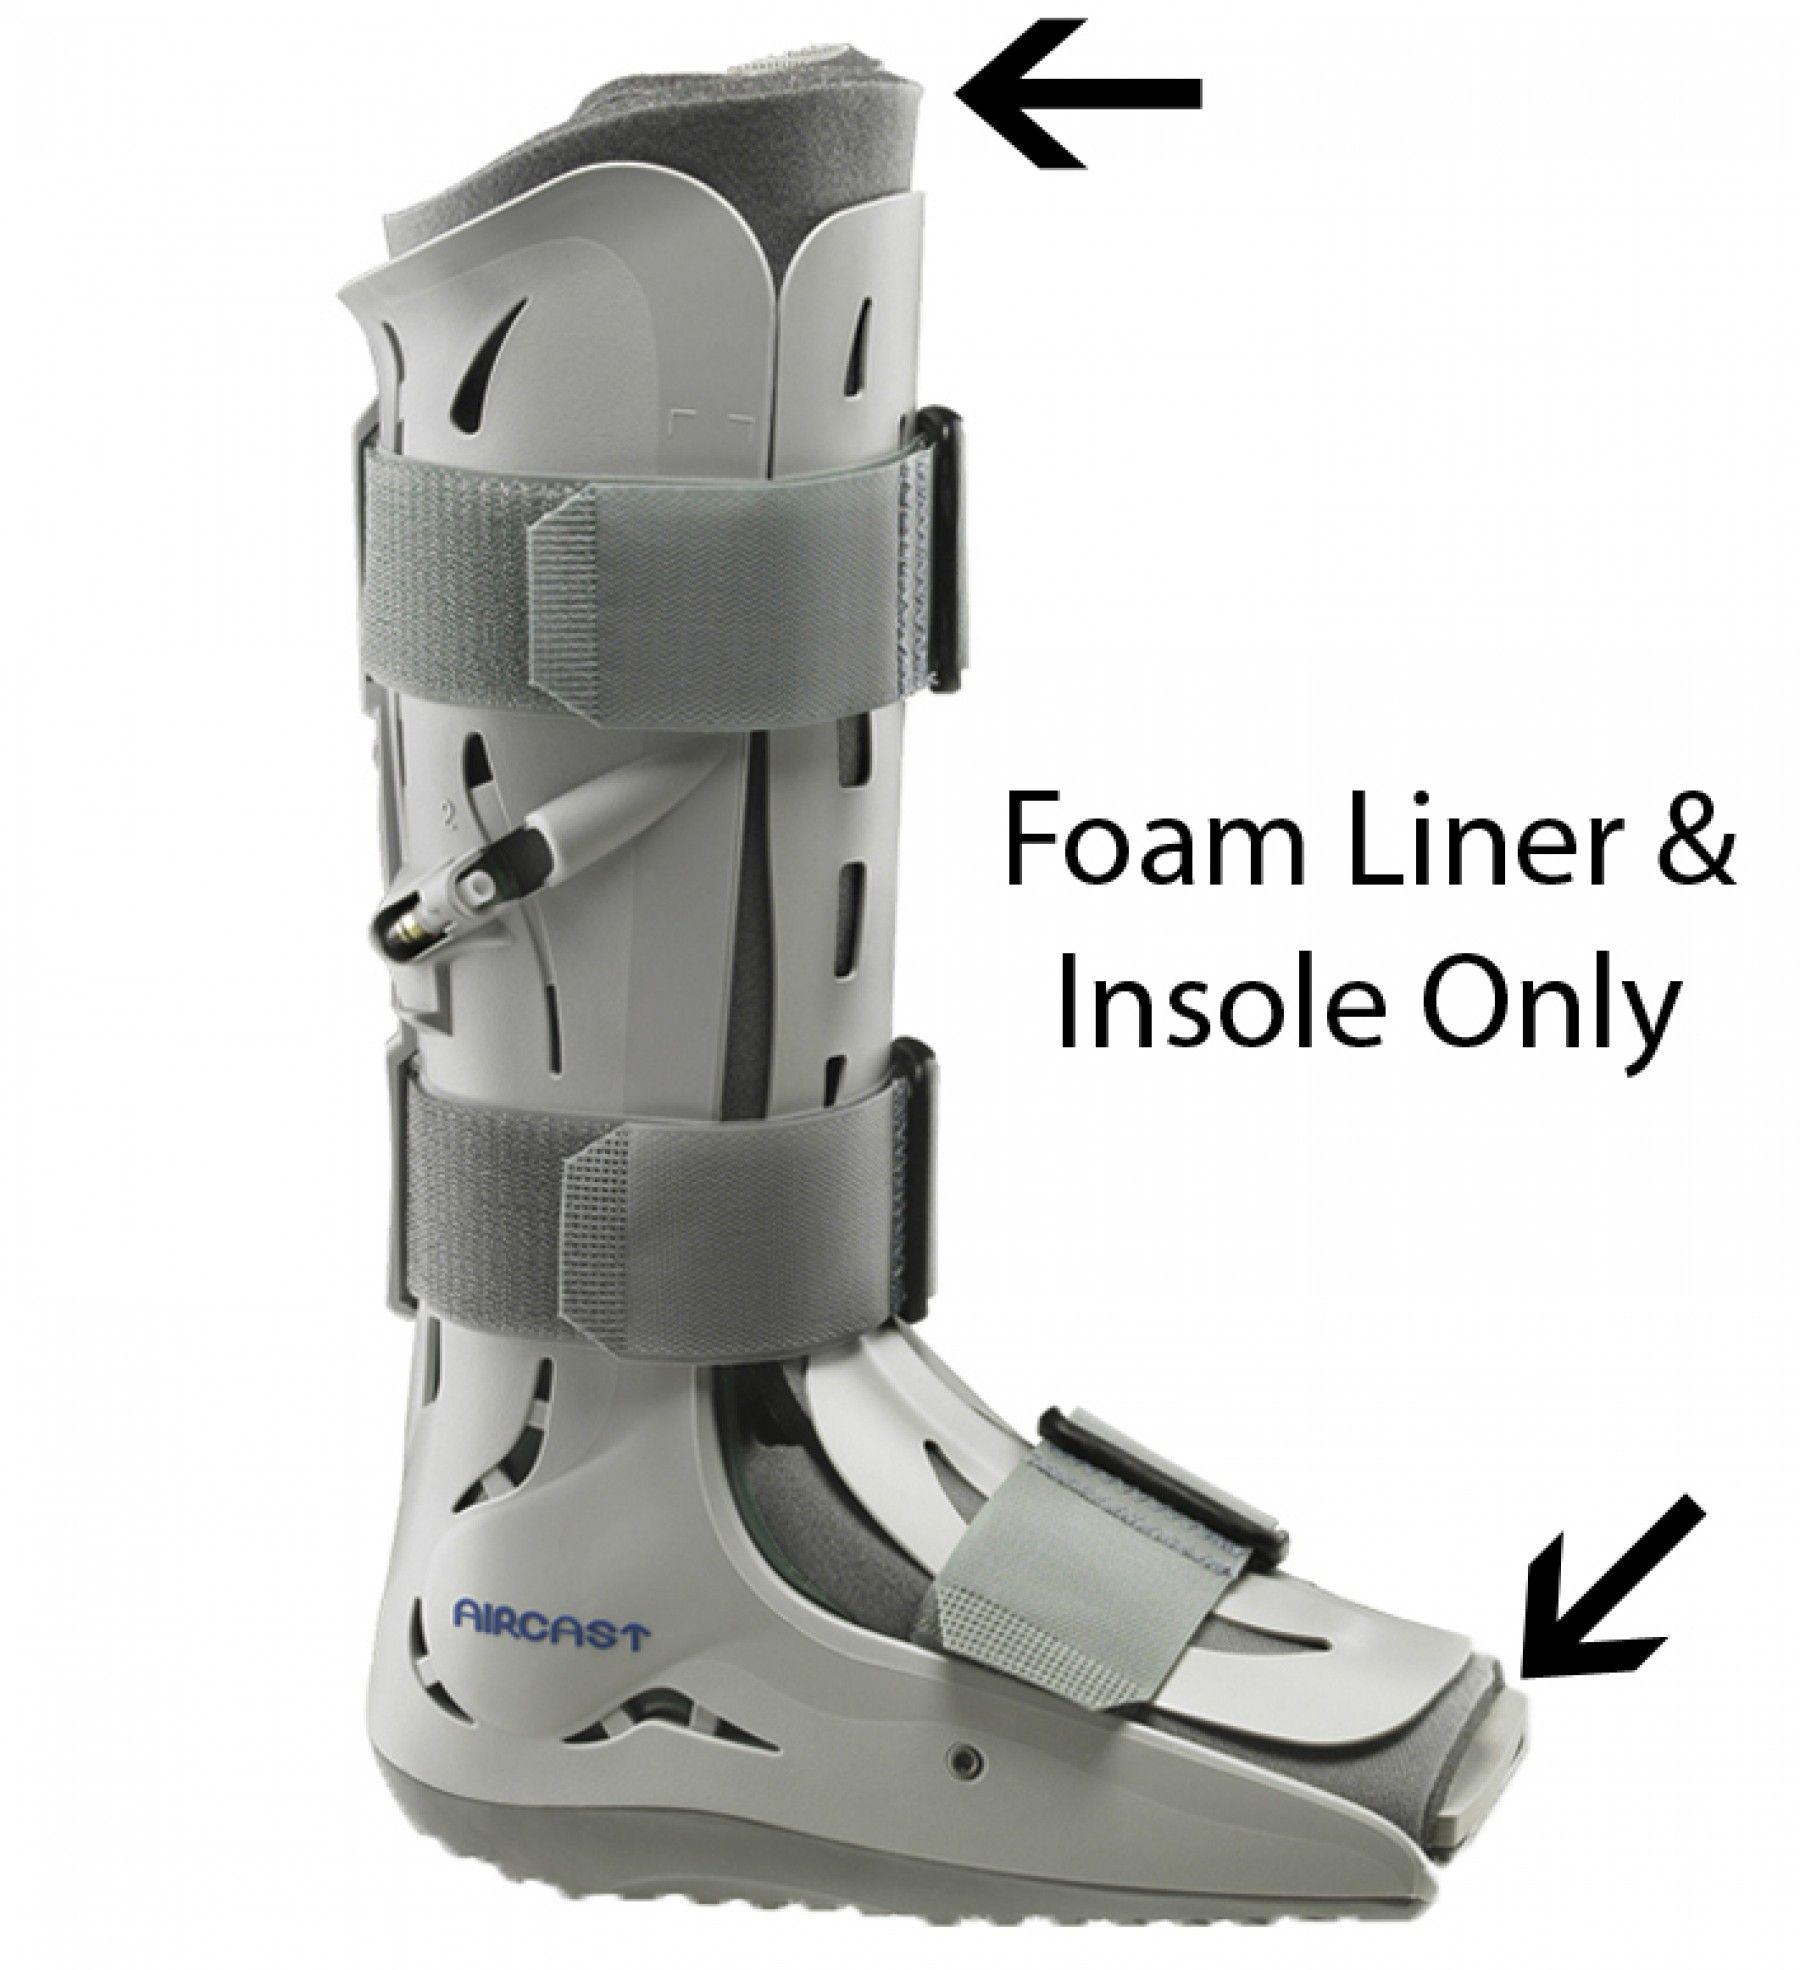 Aircast Walker Replacement Foam Liner W Insole Walker Boots Broken Leg Ankle Injury